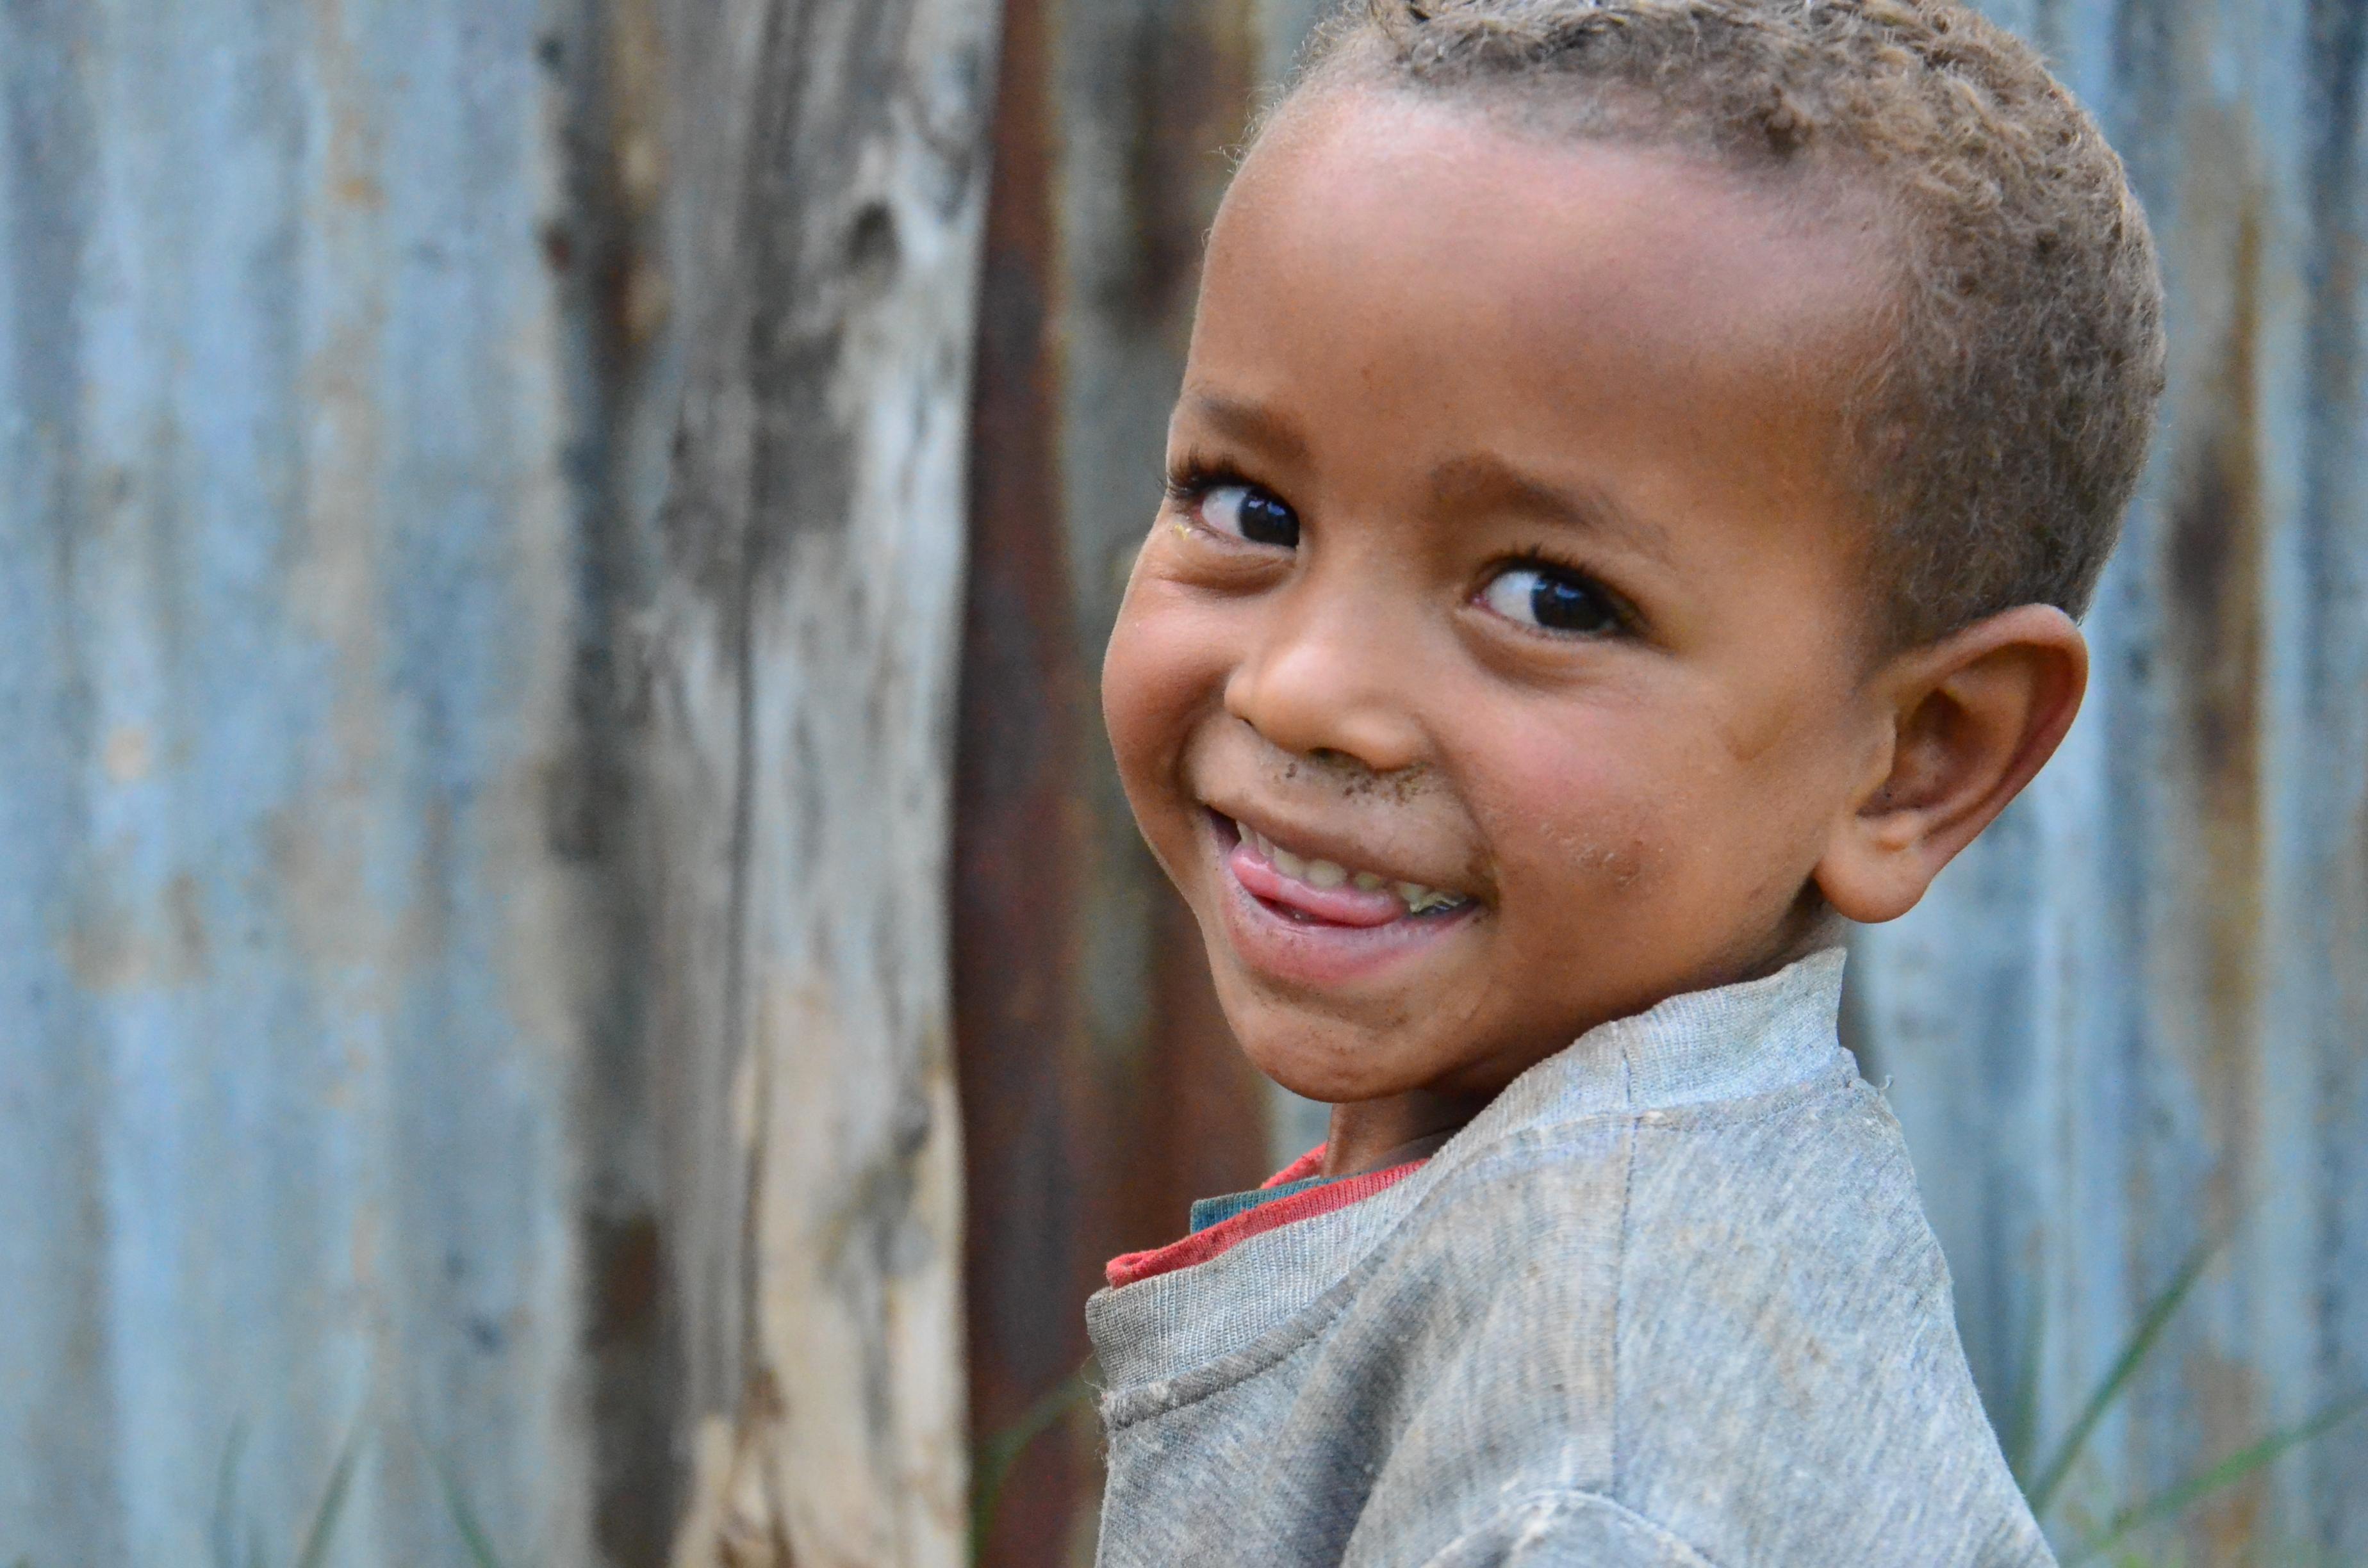 Ethiopian boy malnutrition smiling